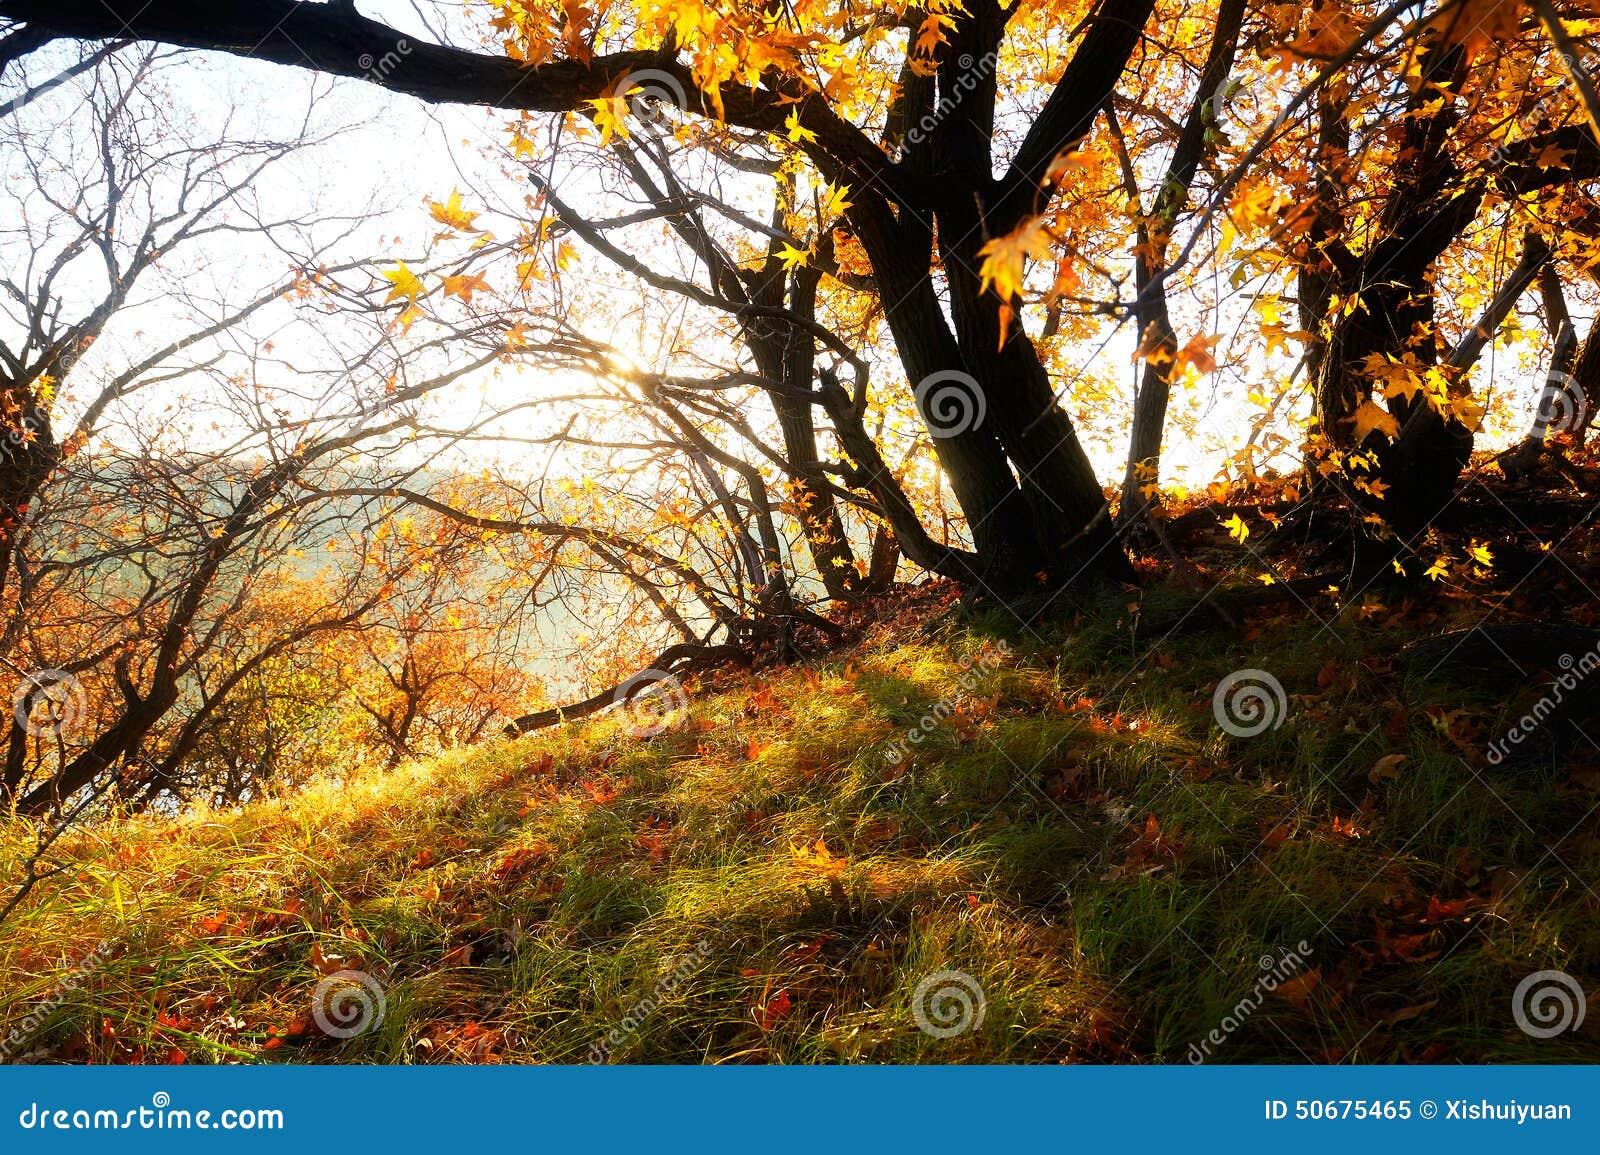 Download 秋叶日出 库存图片. 图片 包括有 叶子, 森林, 风景, 金黄, 城市, 蓝色, 公园, 天空, 航空 - 50675465